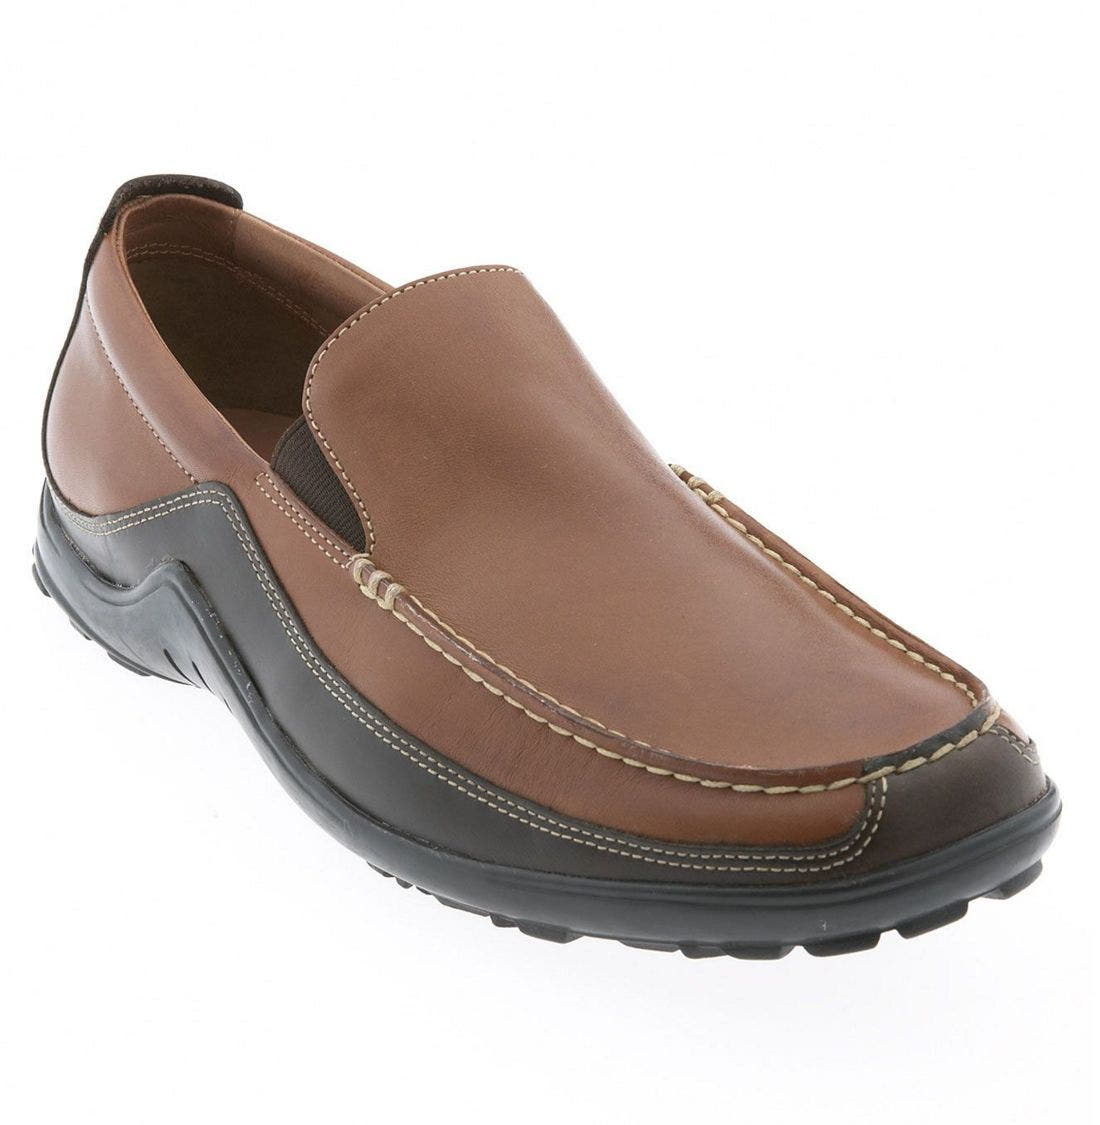 COLE HAAN 'Tucker Venetian' Loafer, Main, color, TAN